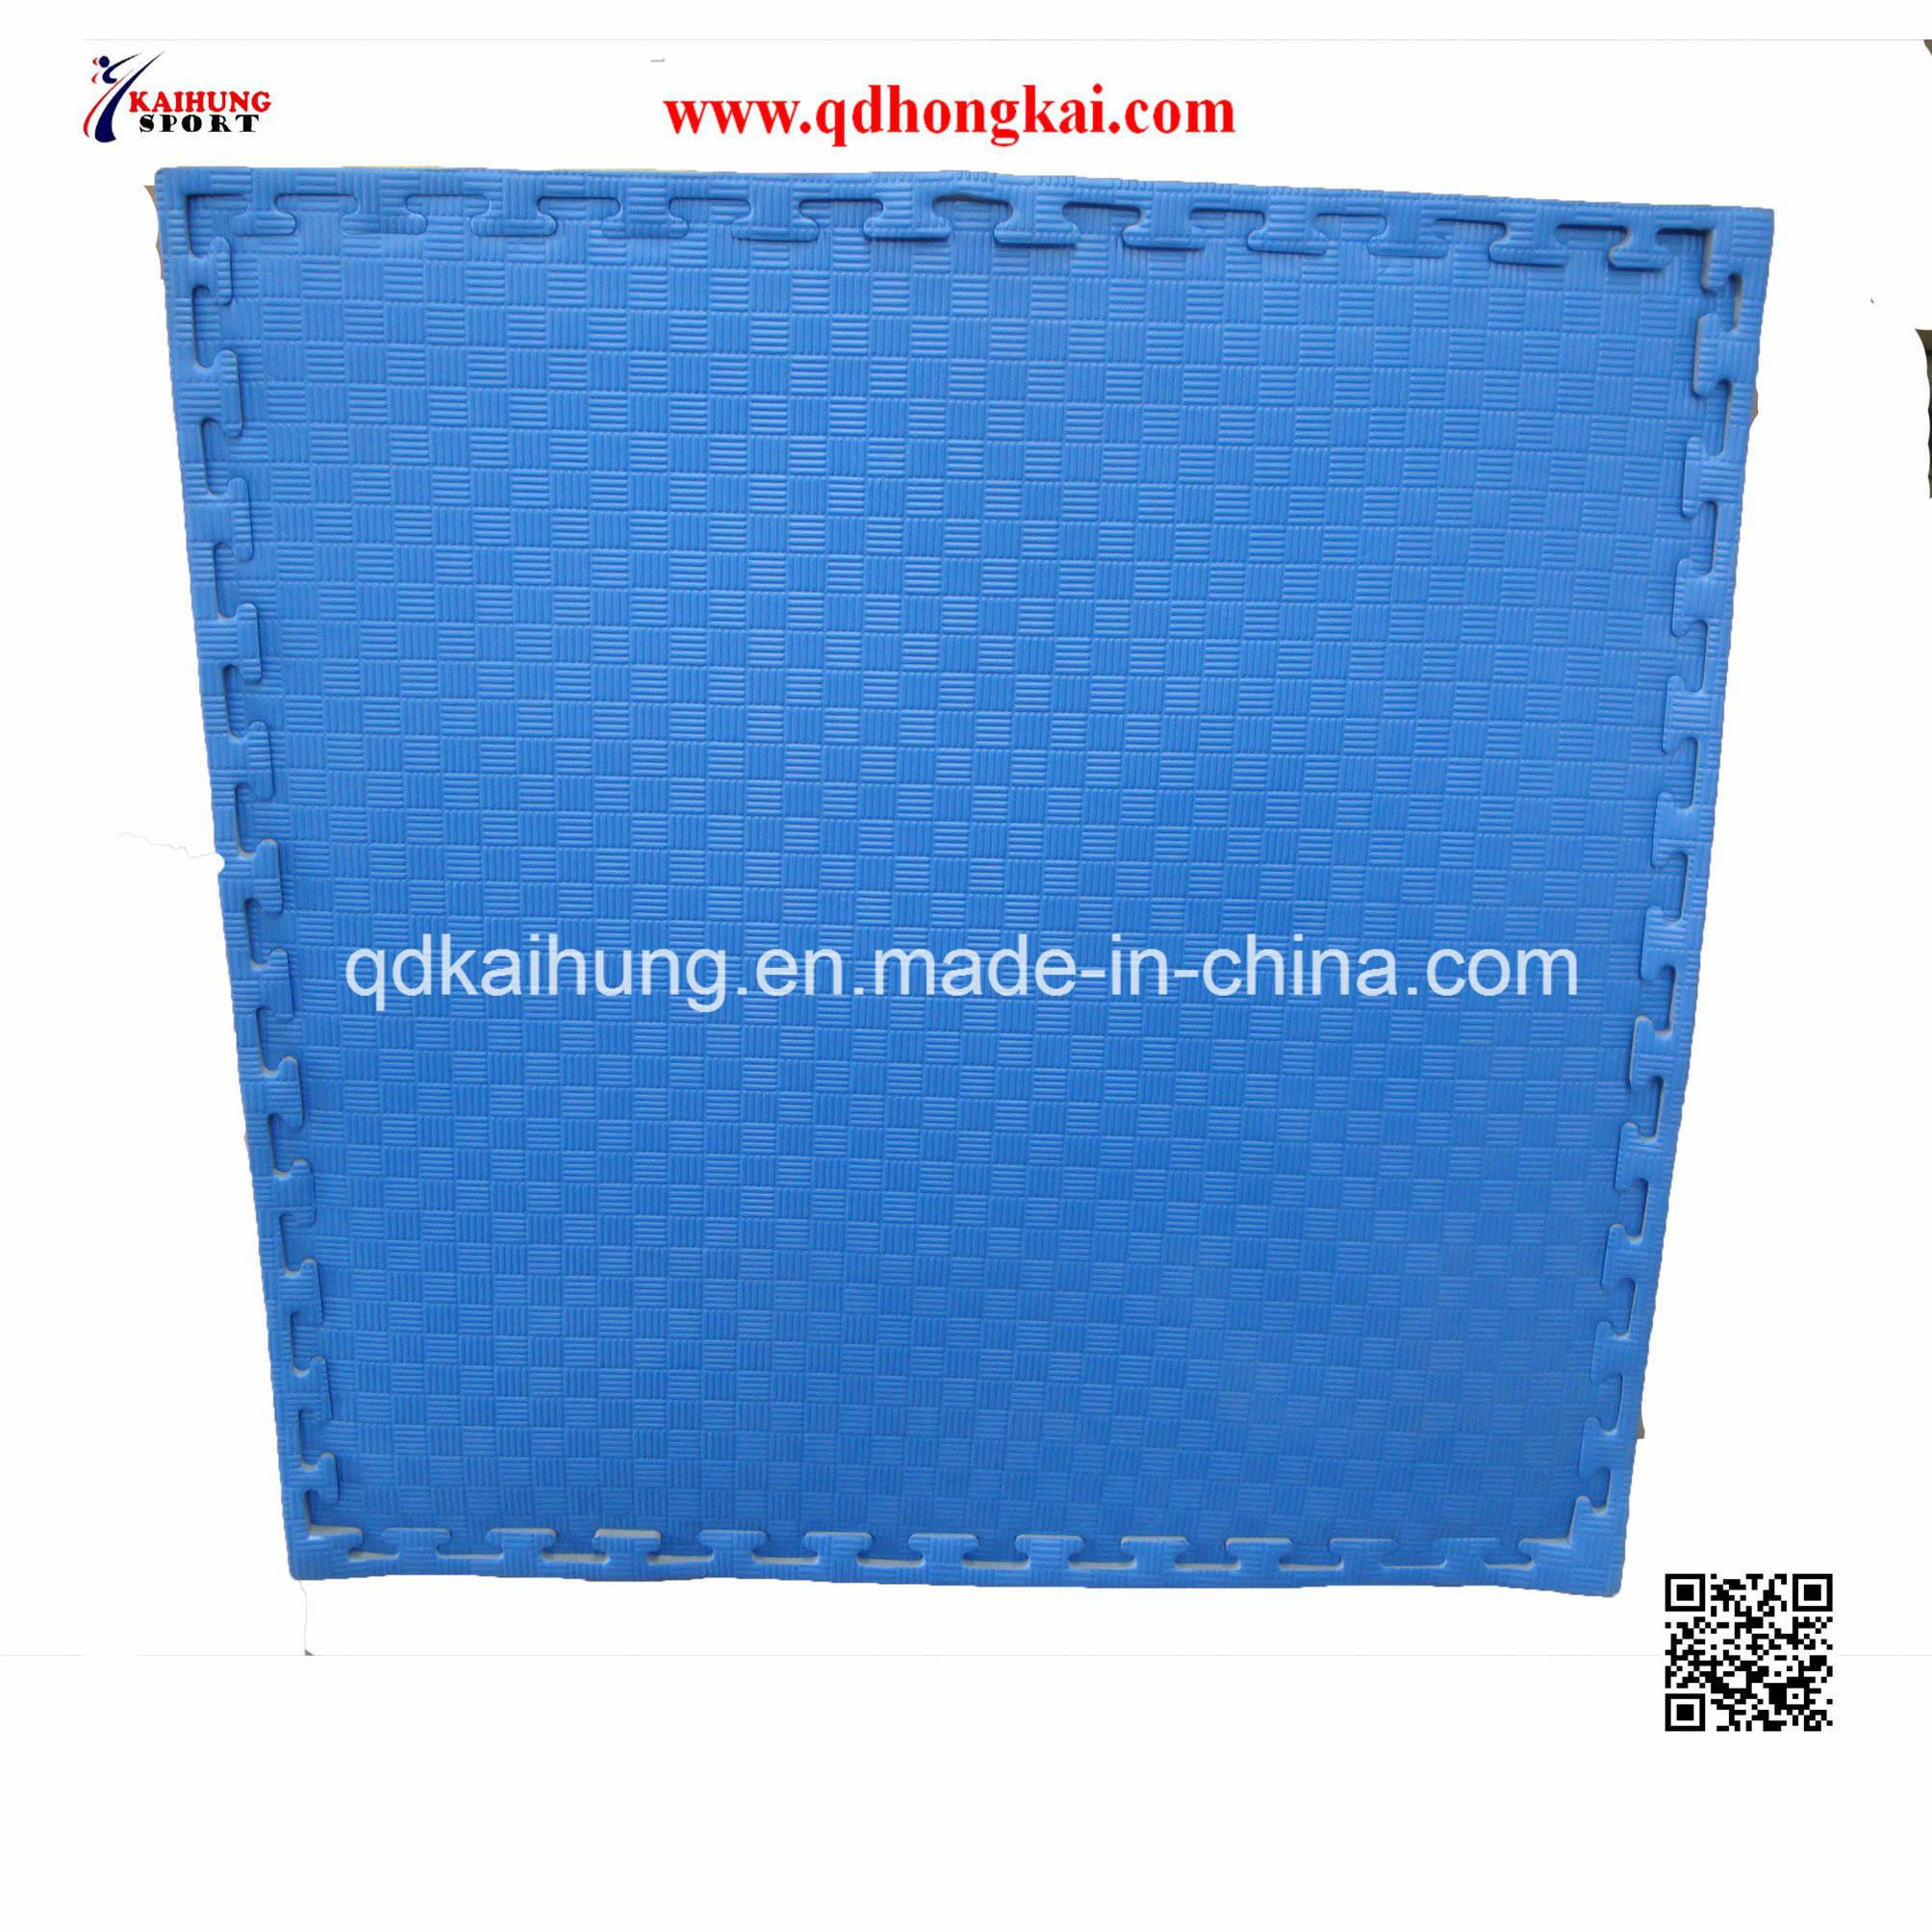 Quality Mats Price China Manufacturers Evamat Bambu 30 Suppliers